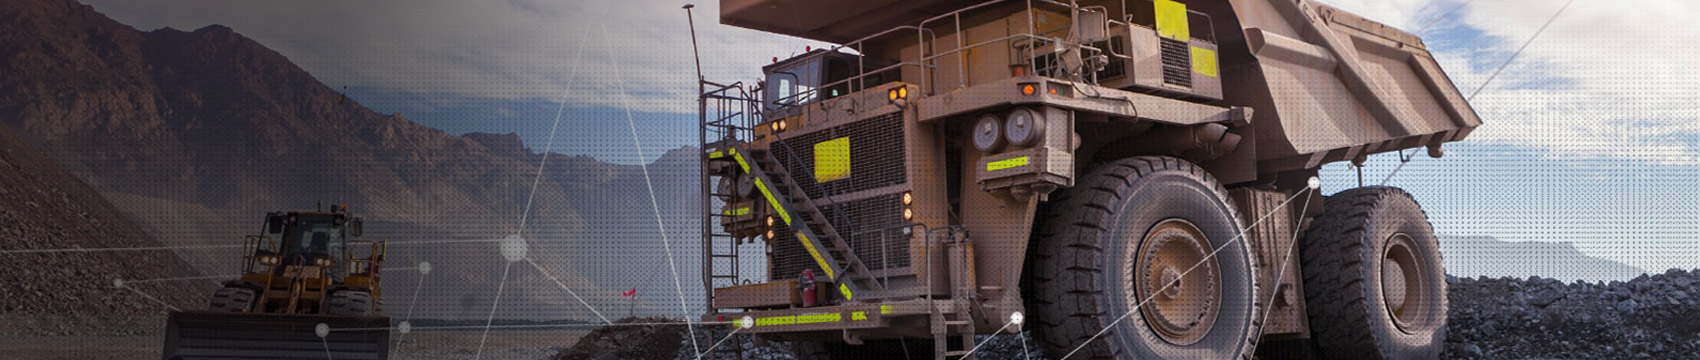 mining fleet safety solutions